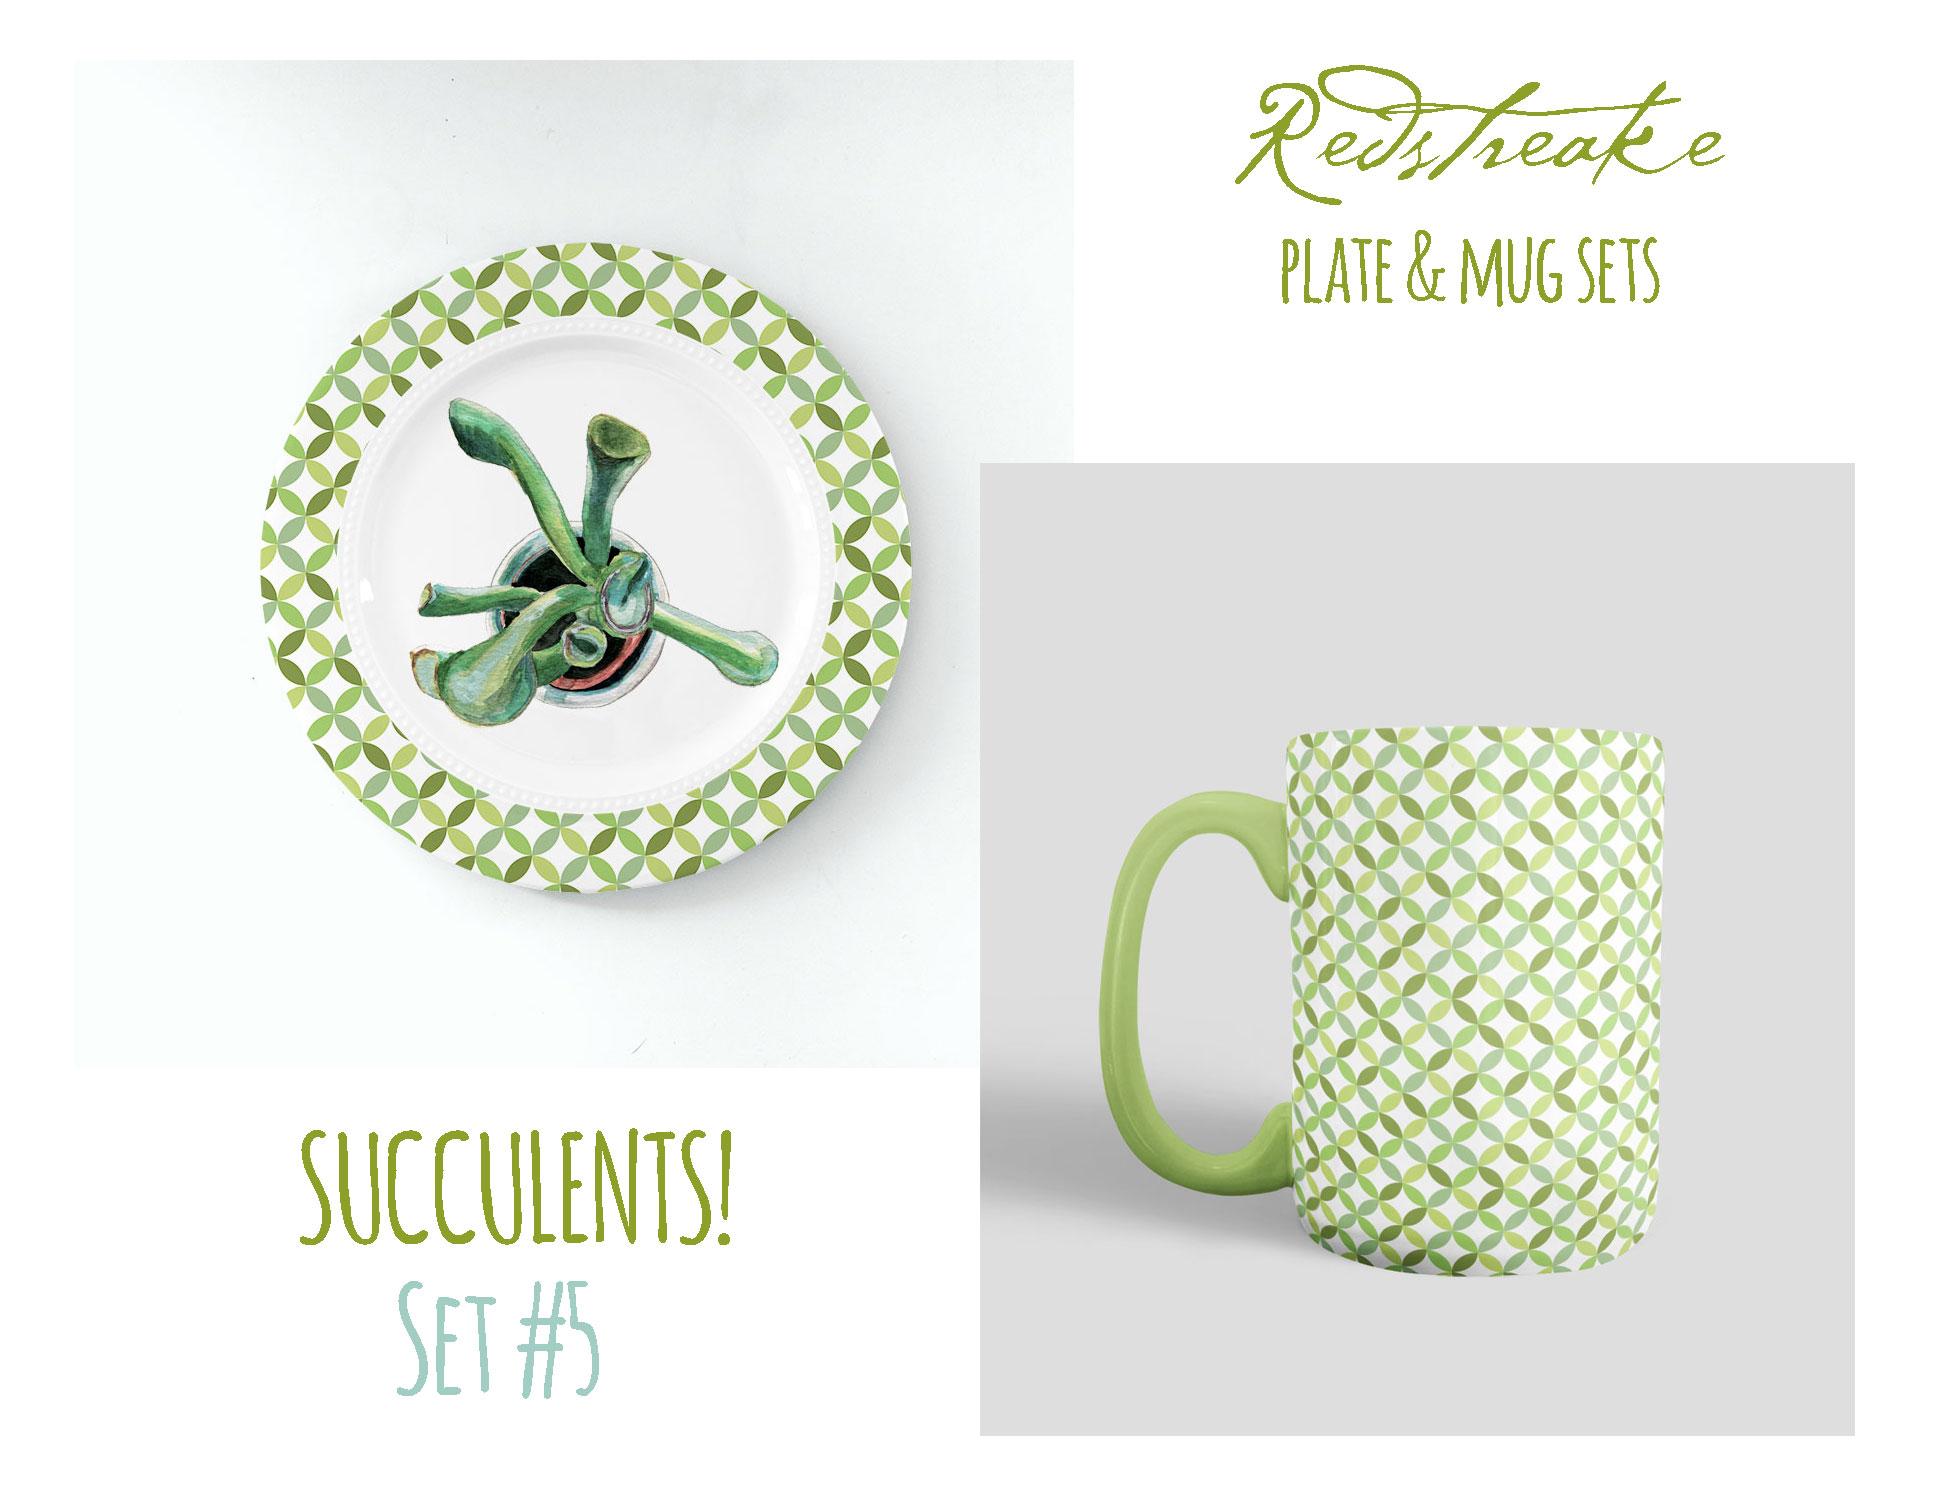 set5_succulentware.jpg